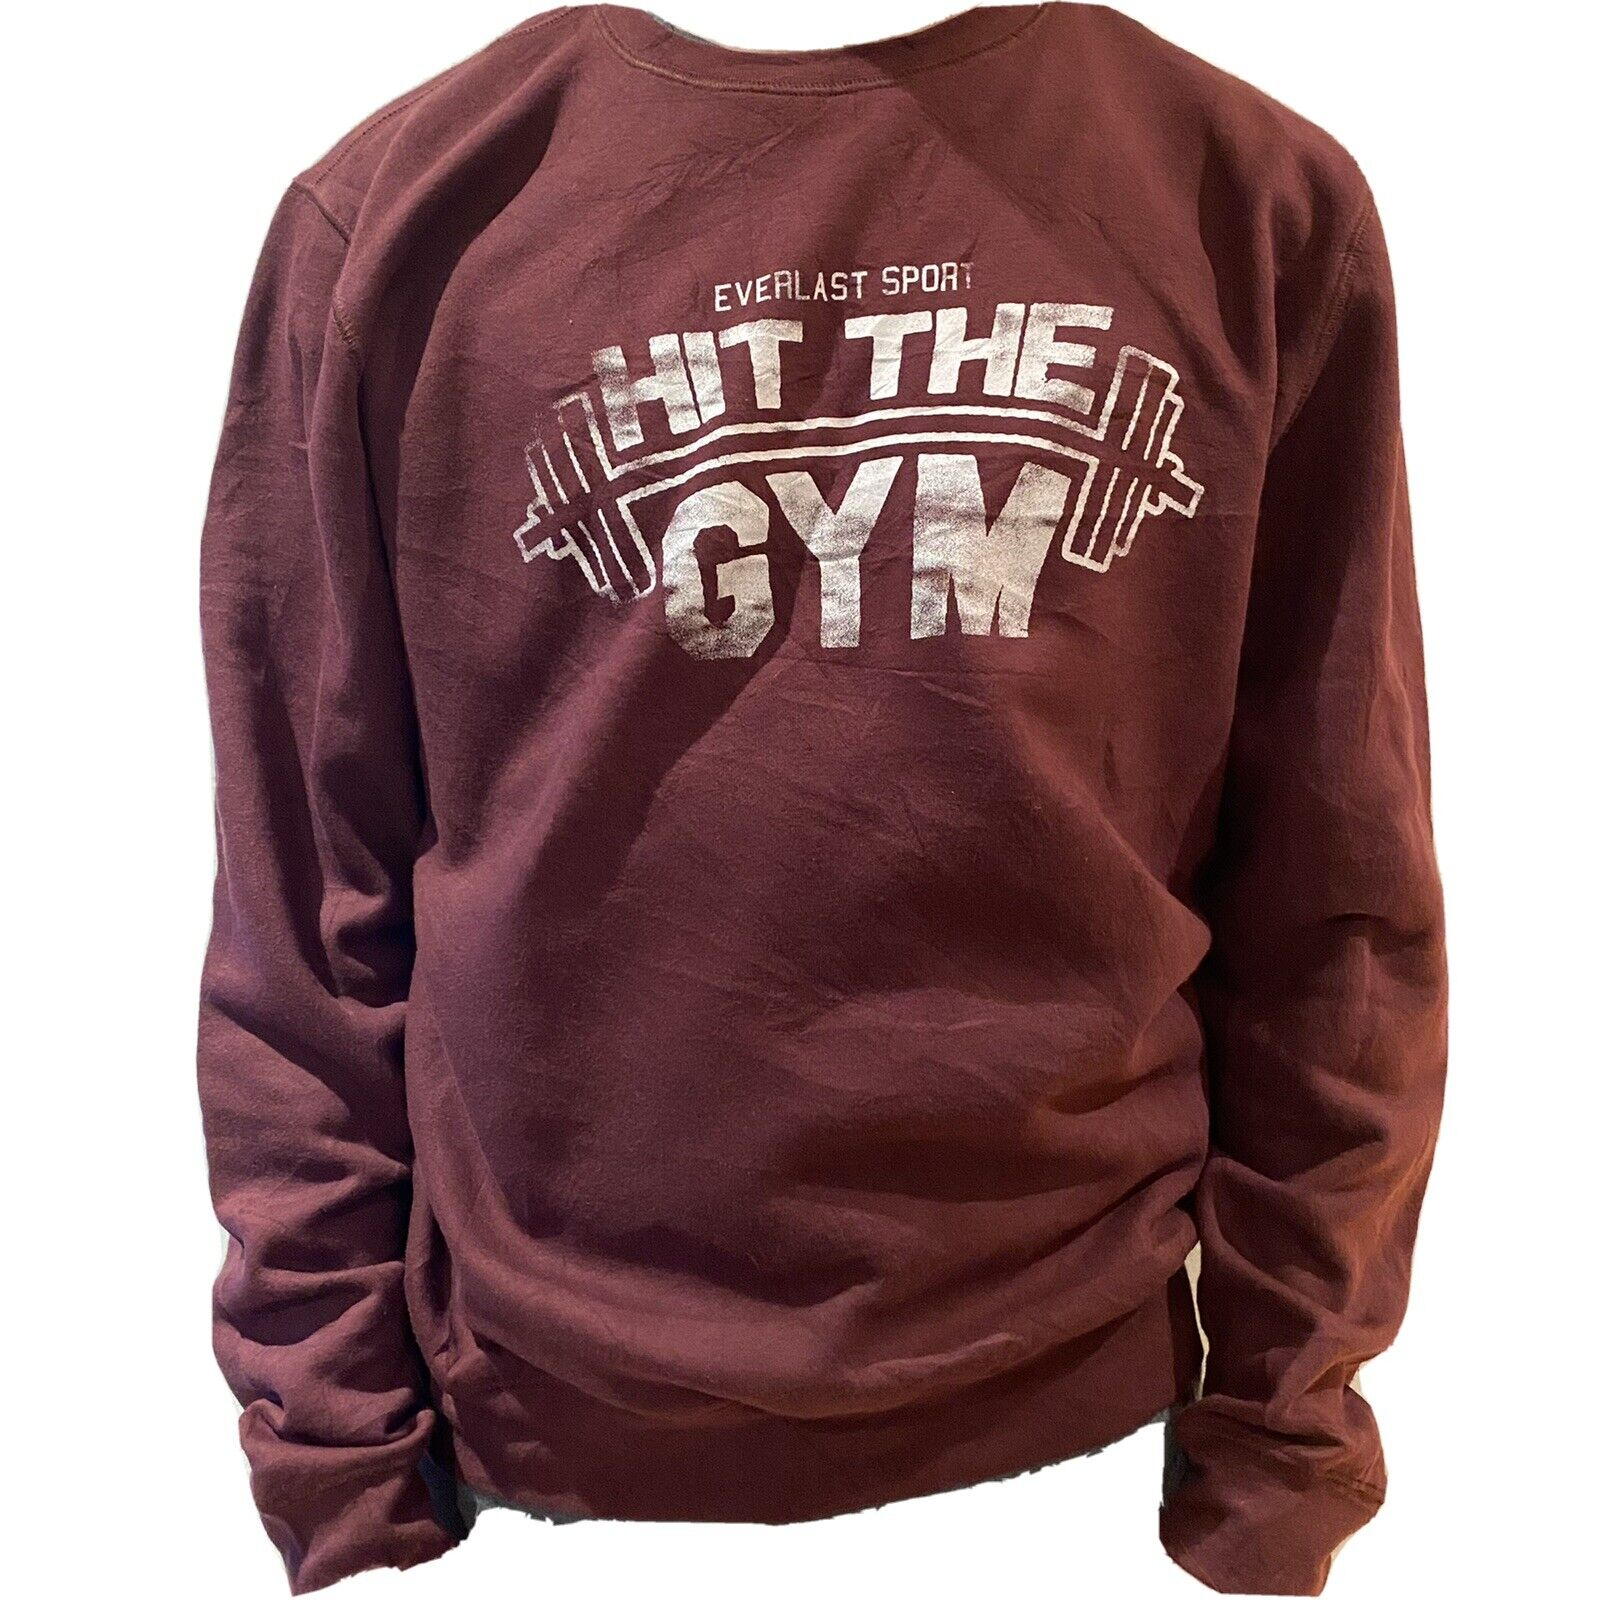 Everlast Sport Sweatshirt